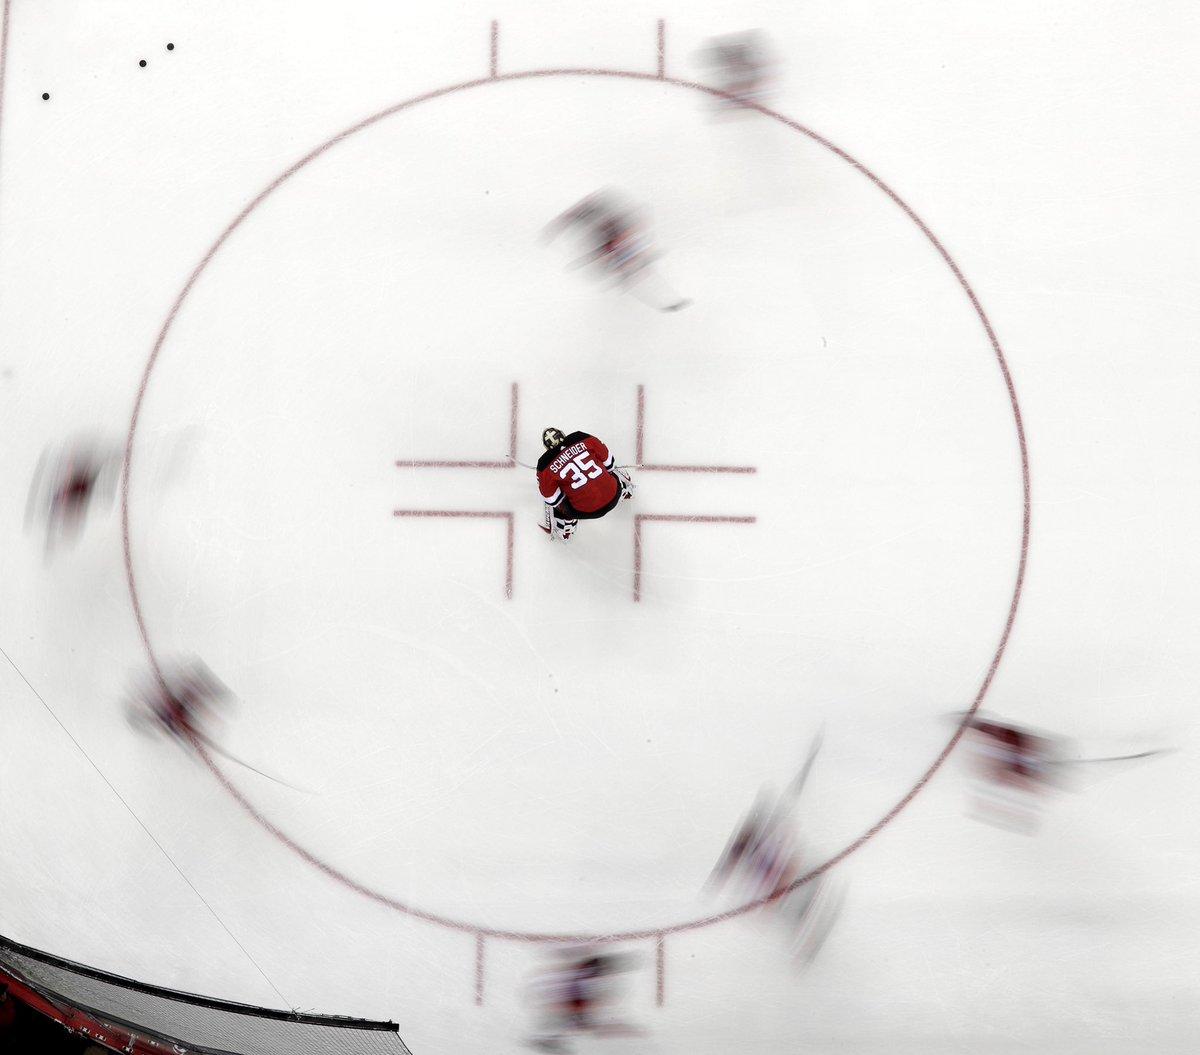 Fun photo from the remote during warmups prior to Devils vs Senators NHL game in Newark.